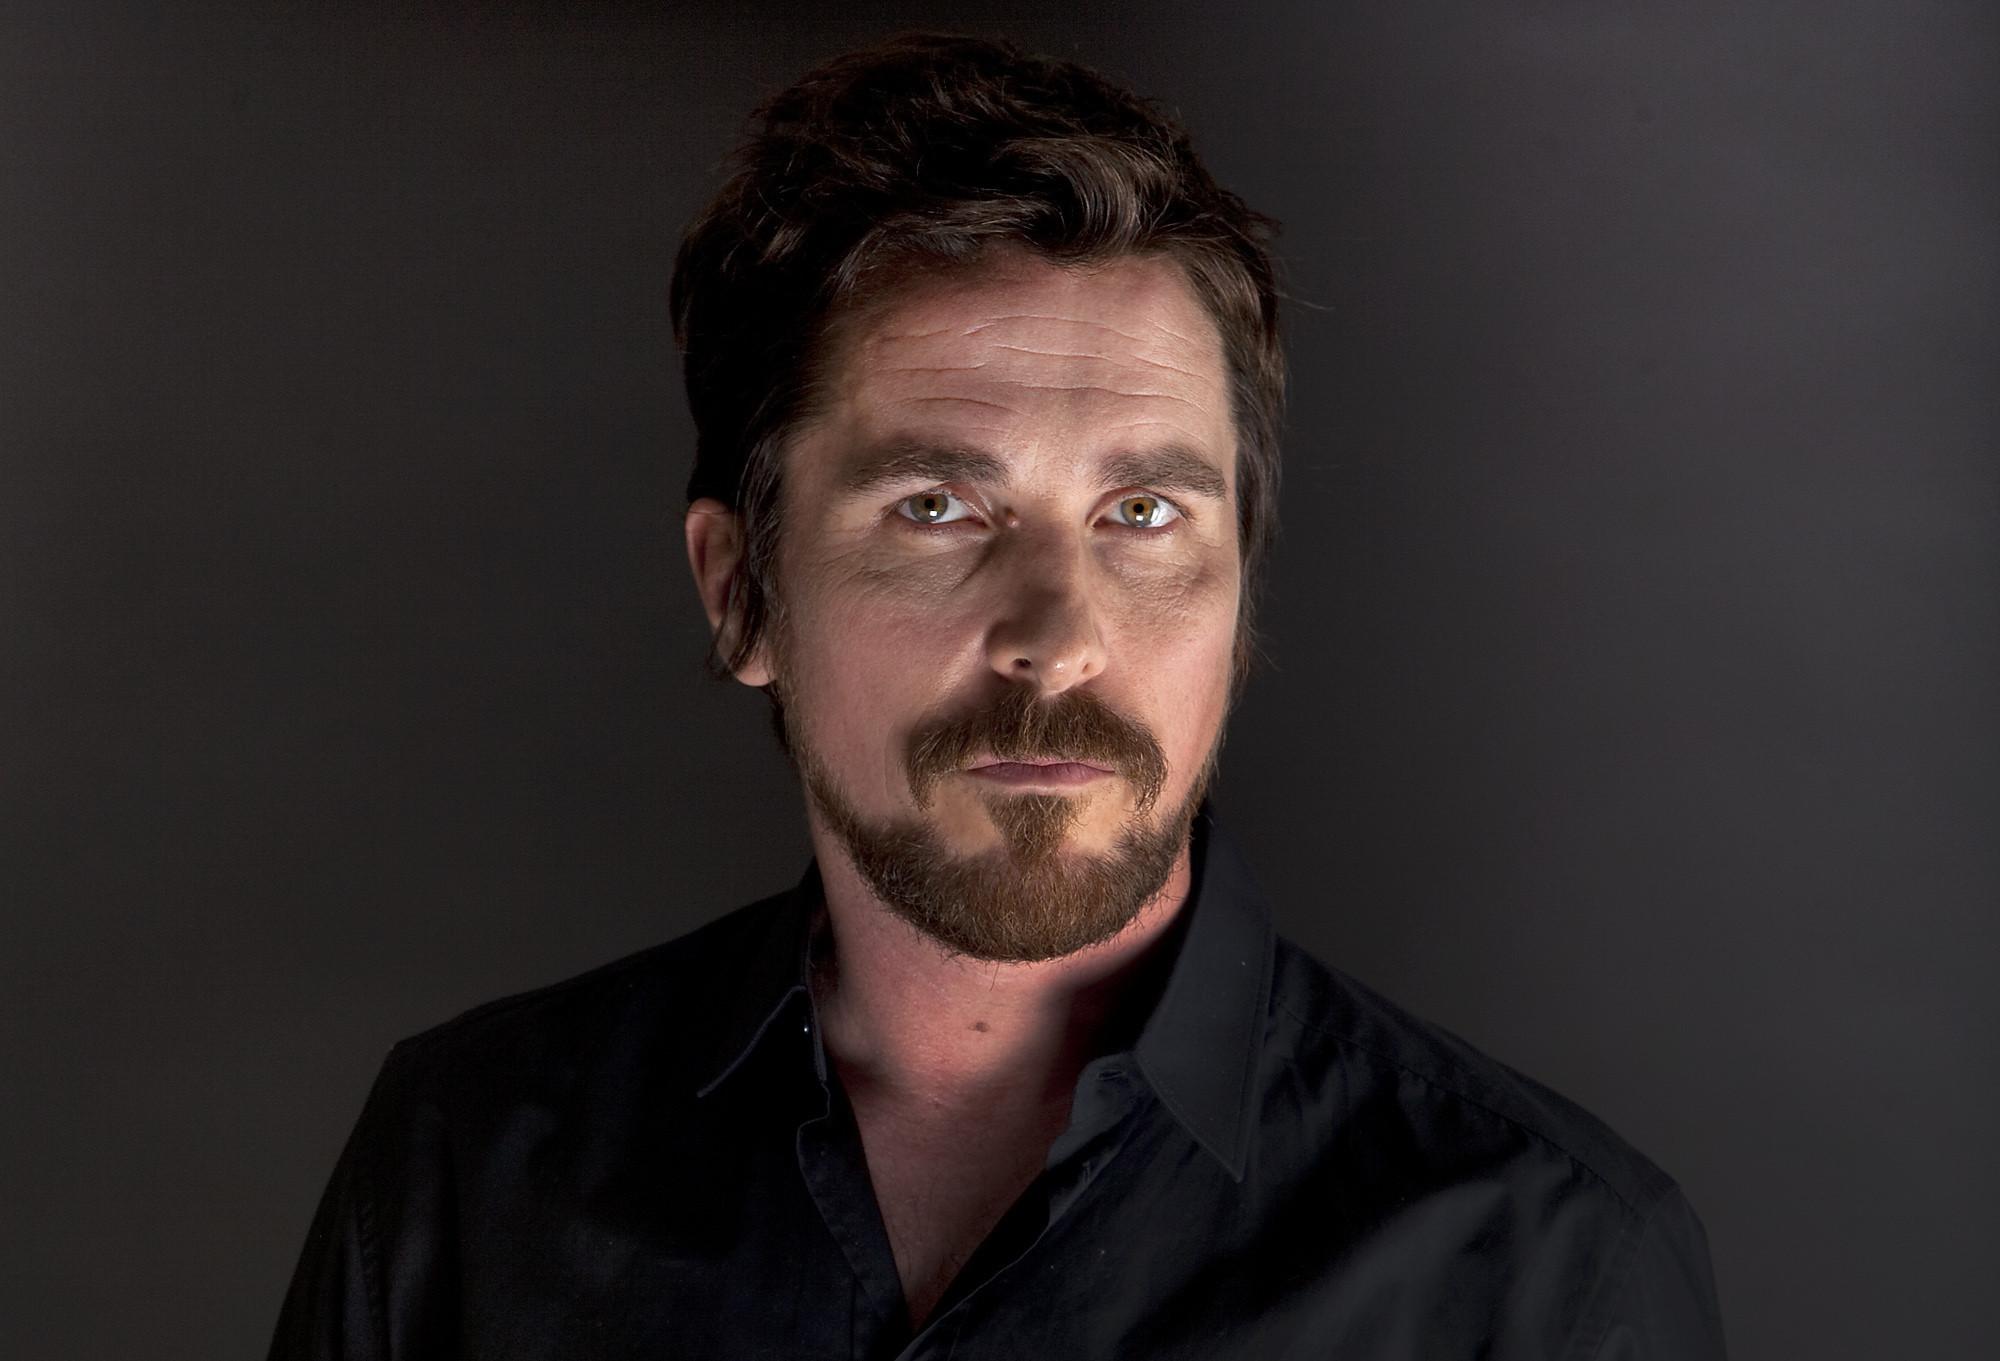 Christian Bale: Christian Bale In Talks To Play Steve Jobs For Sony, Danny